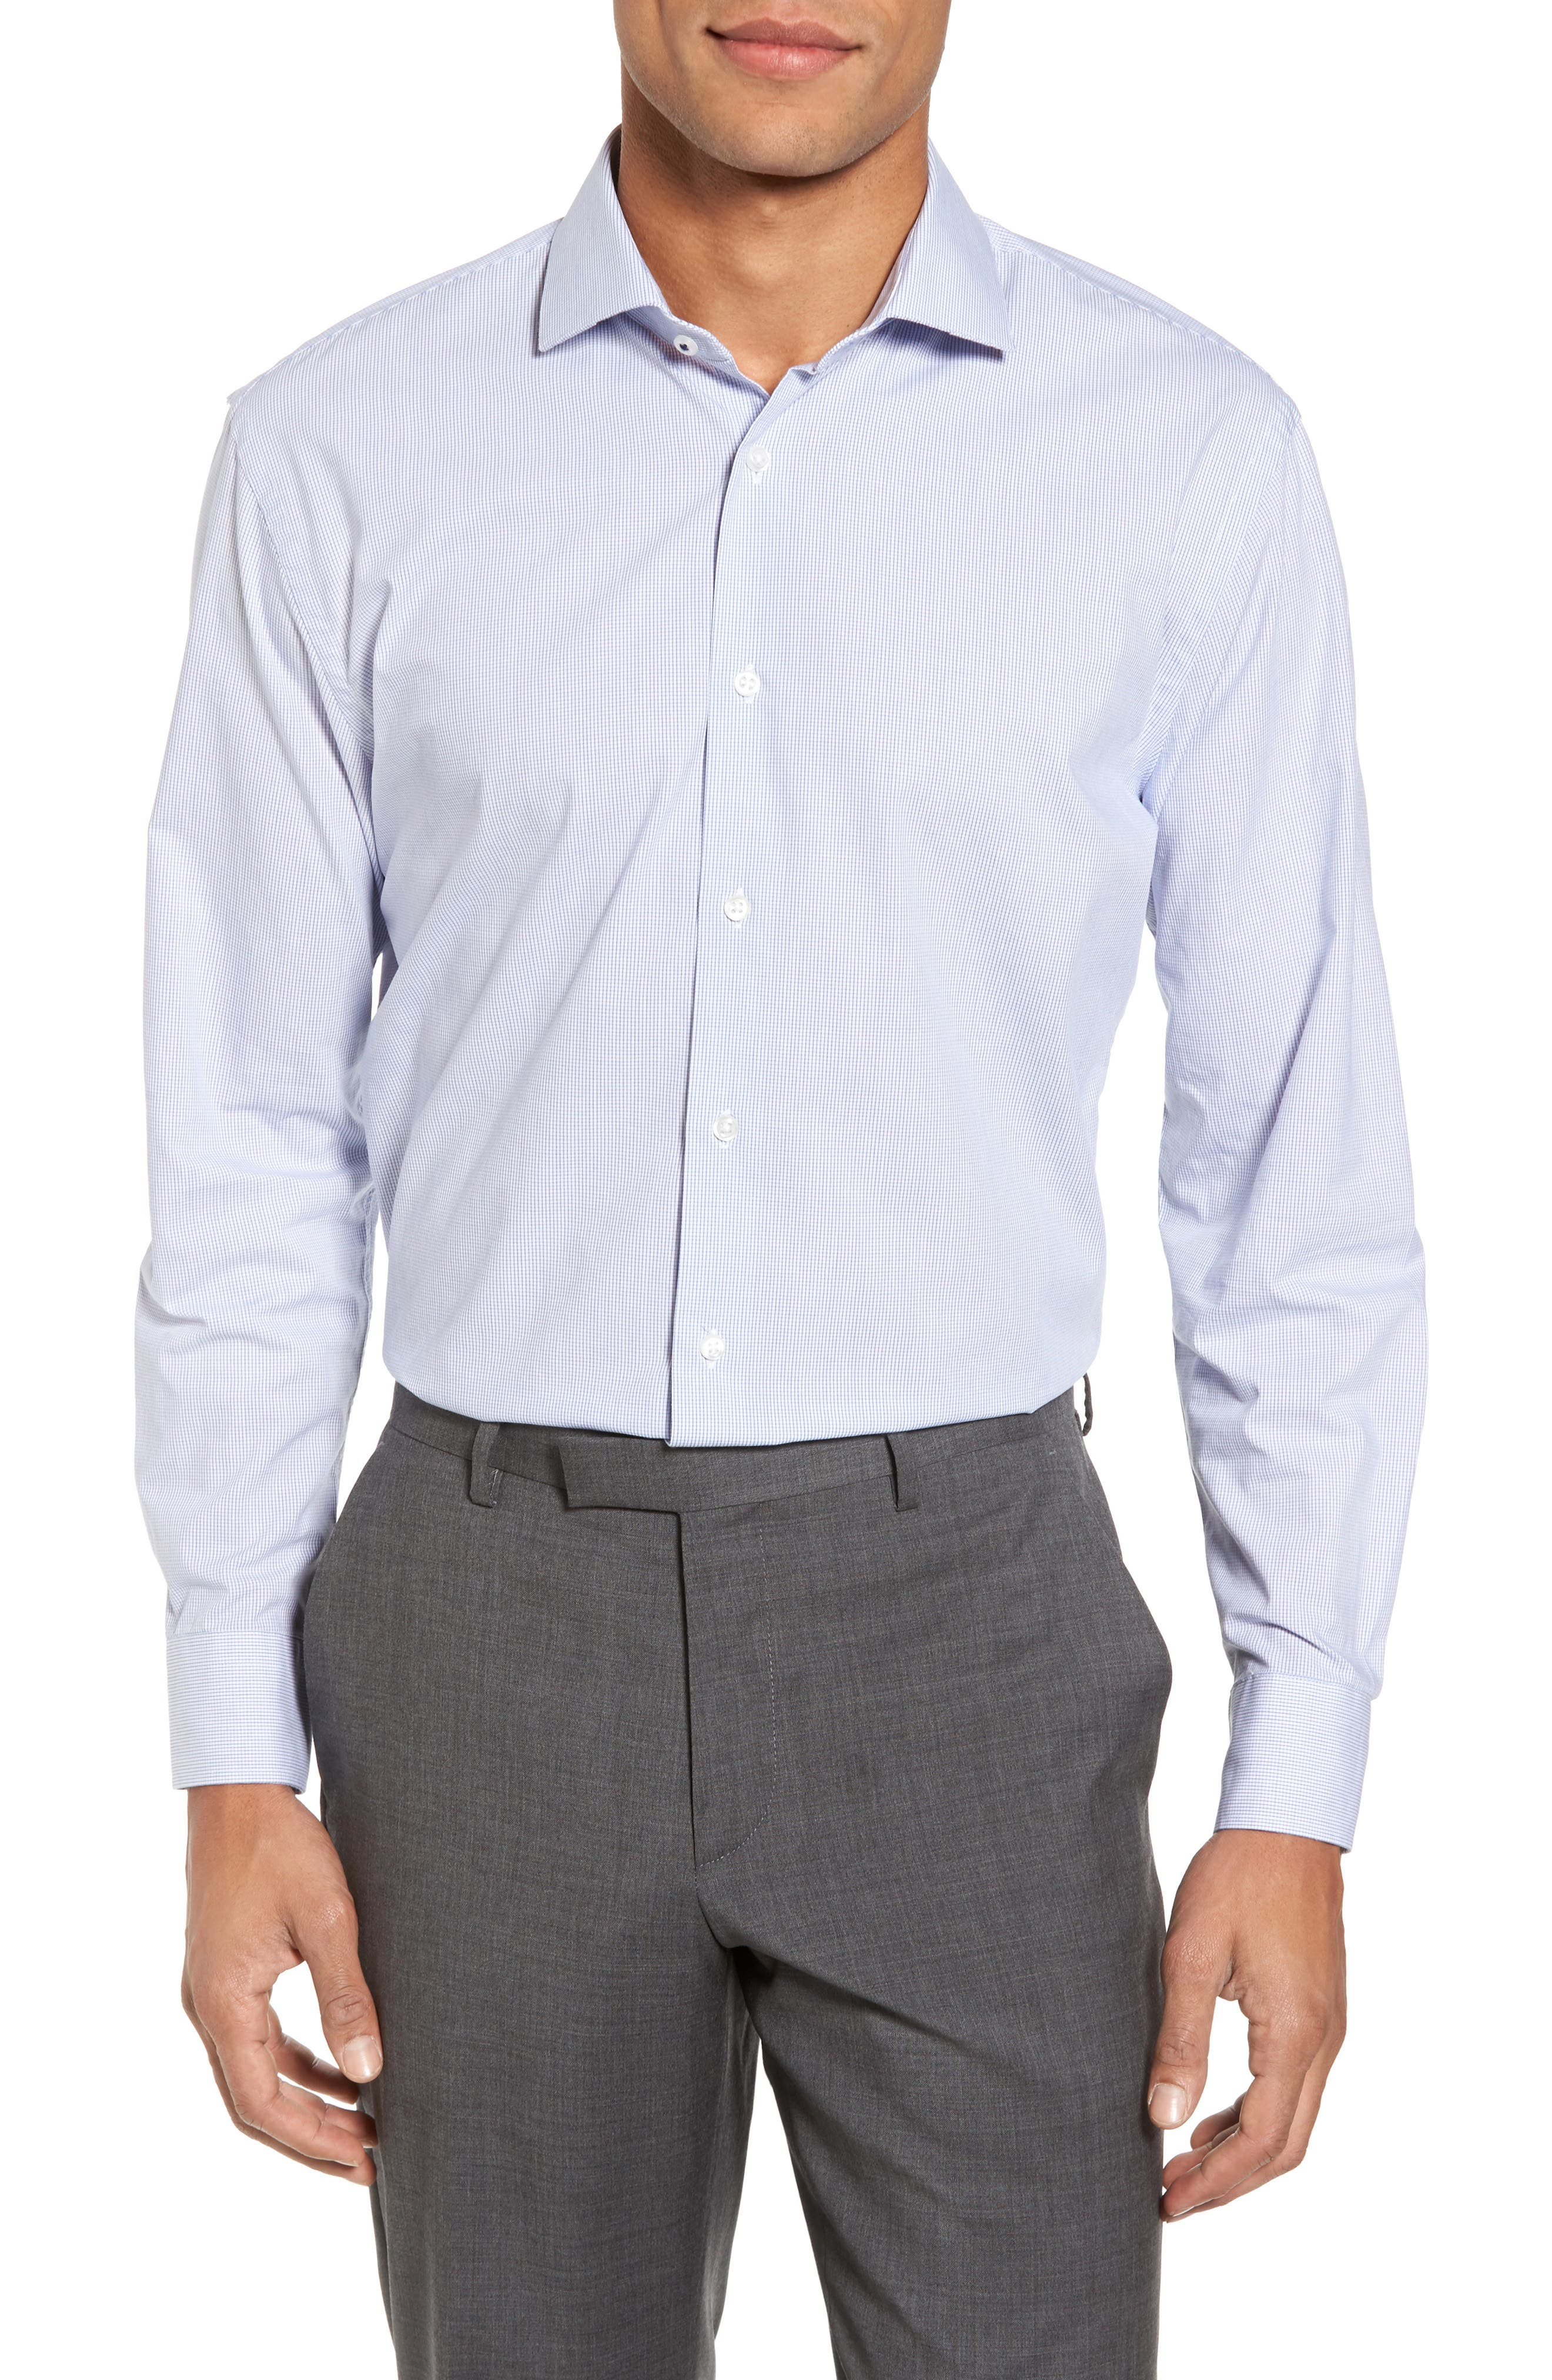 Main Image - Nordstrom Men's Shop Tech-Smart Trim Fit Stretch Tattersall Dress Shirt